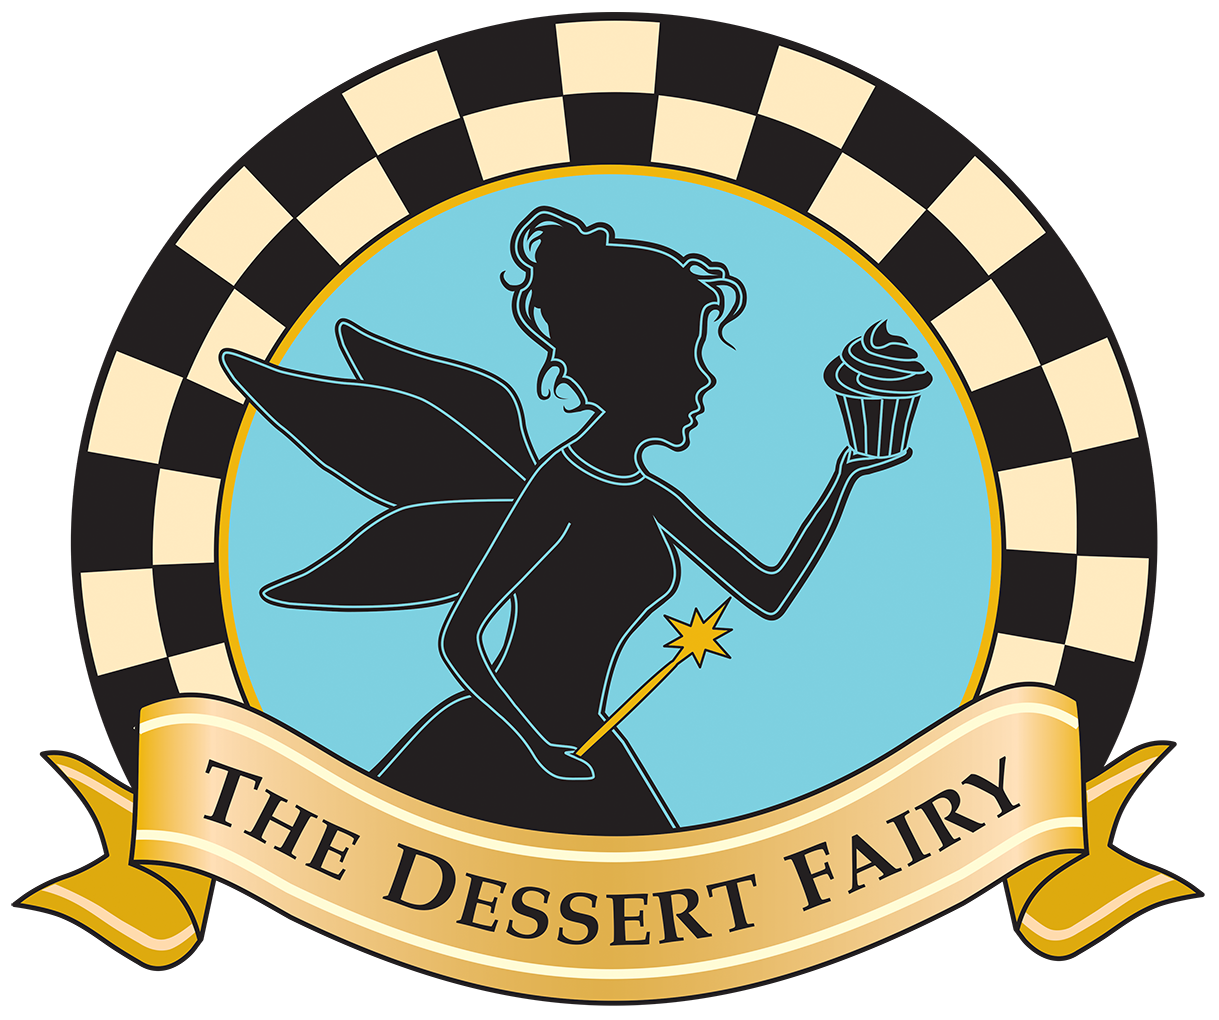 dessertfairysweets.com